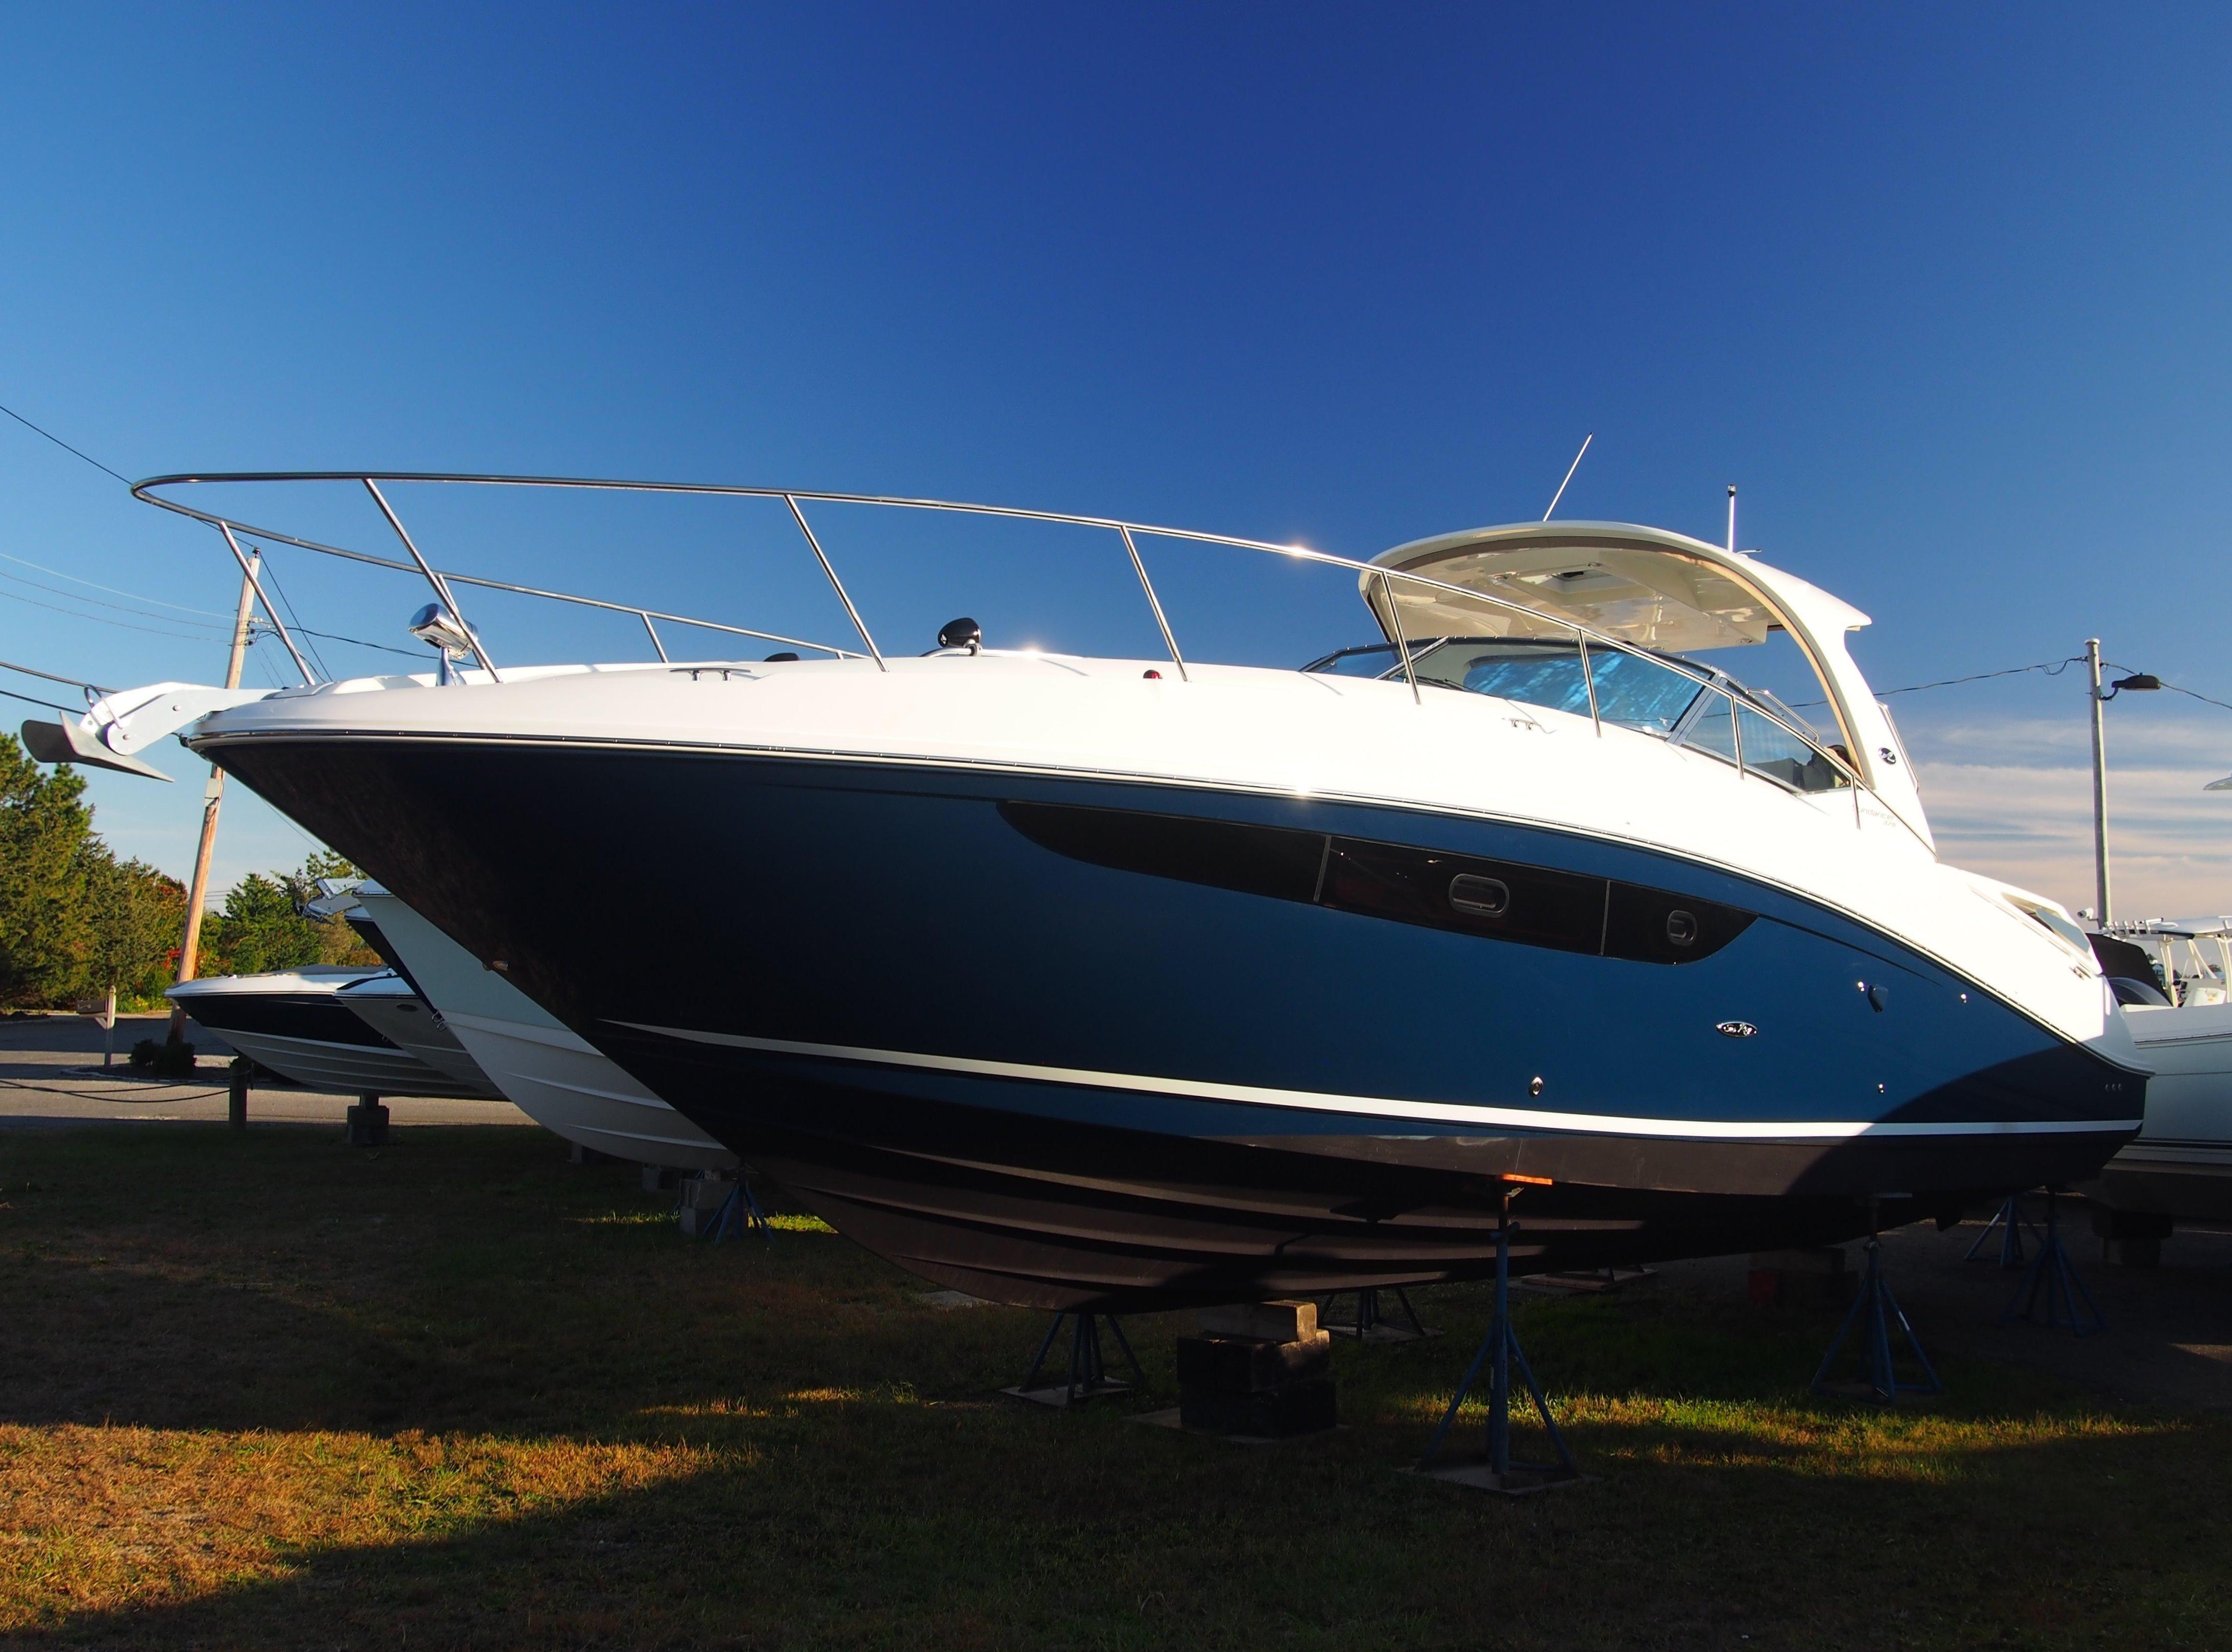 2016 Sea Ray 370 Sundancer Power Boat For Sale Www